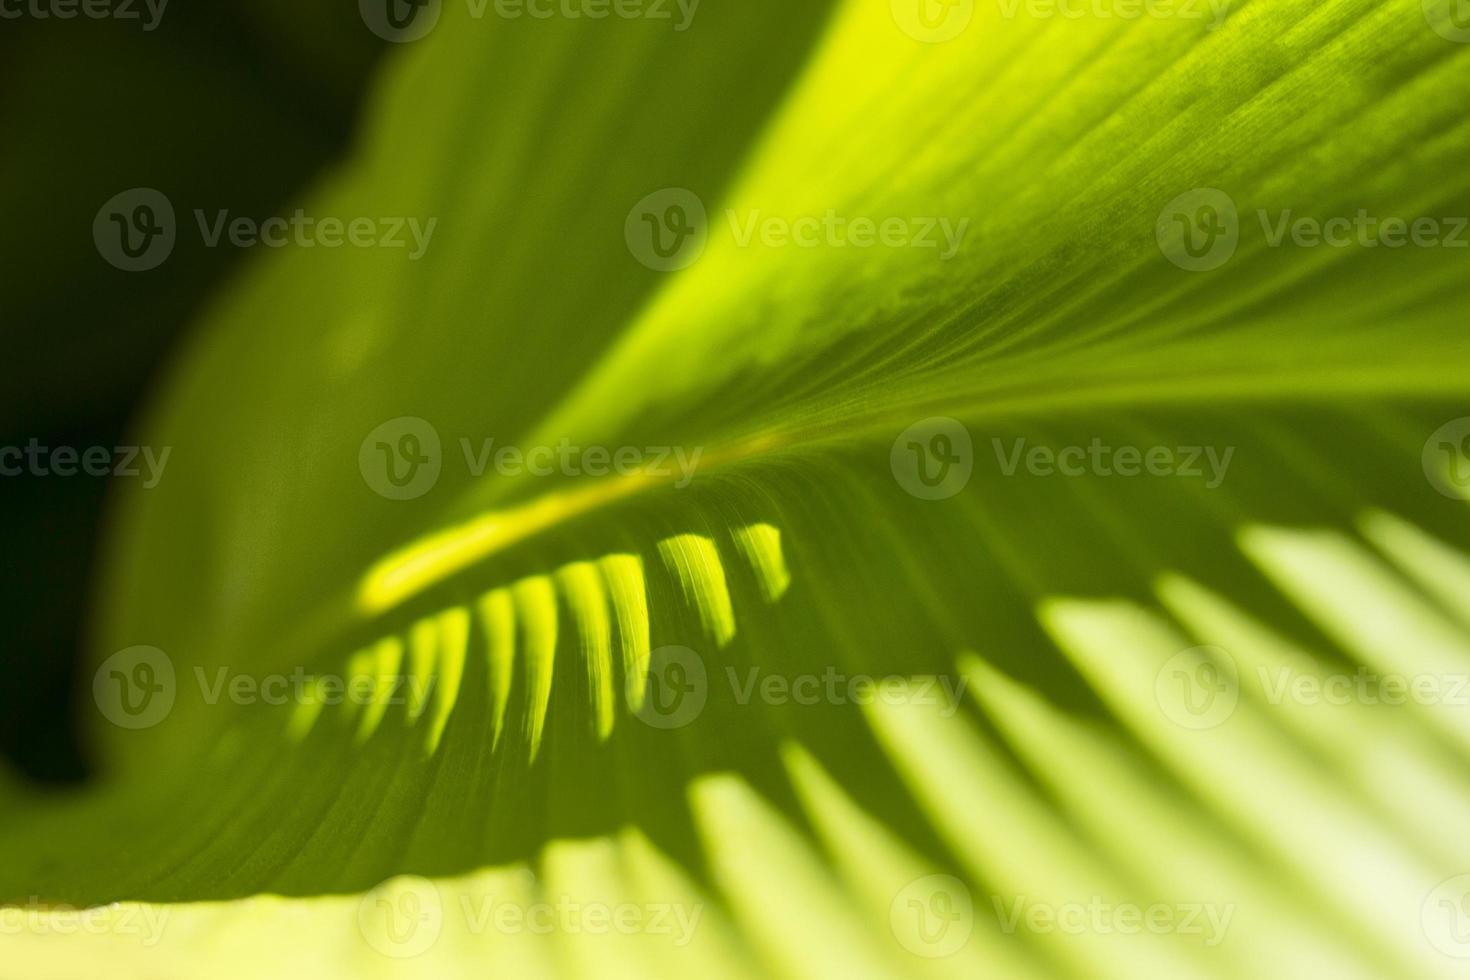 Leaf, Close-up photo